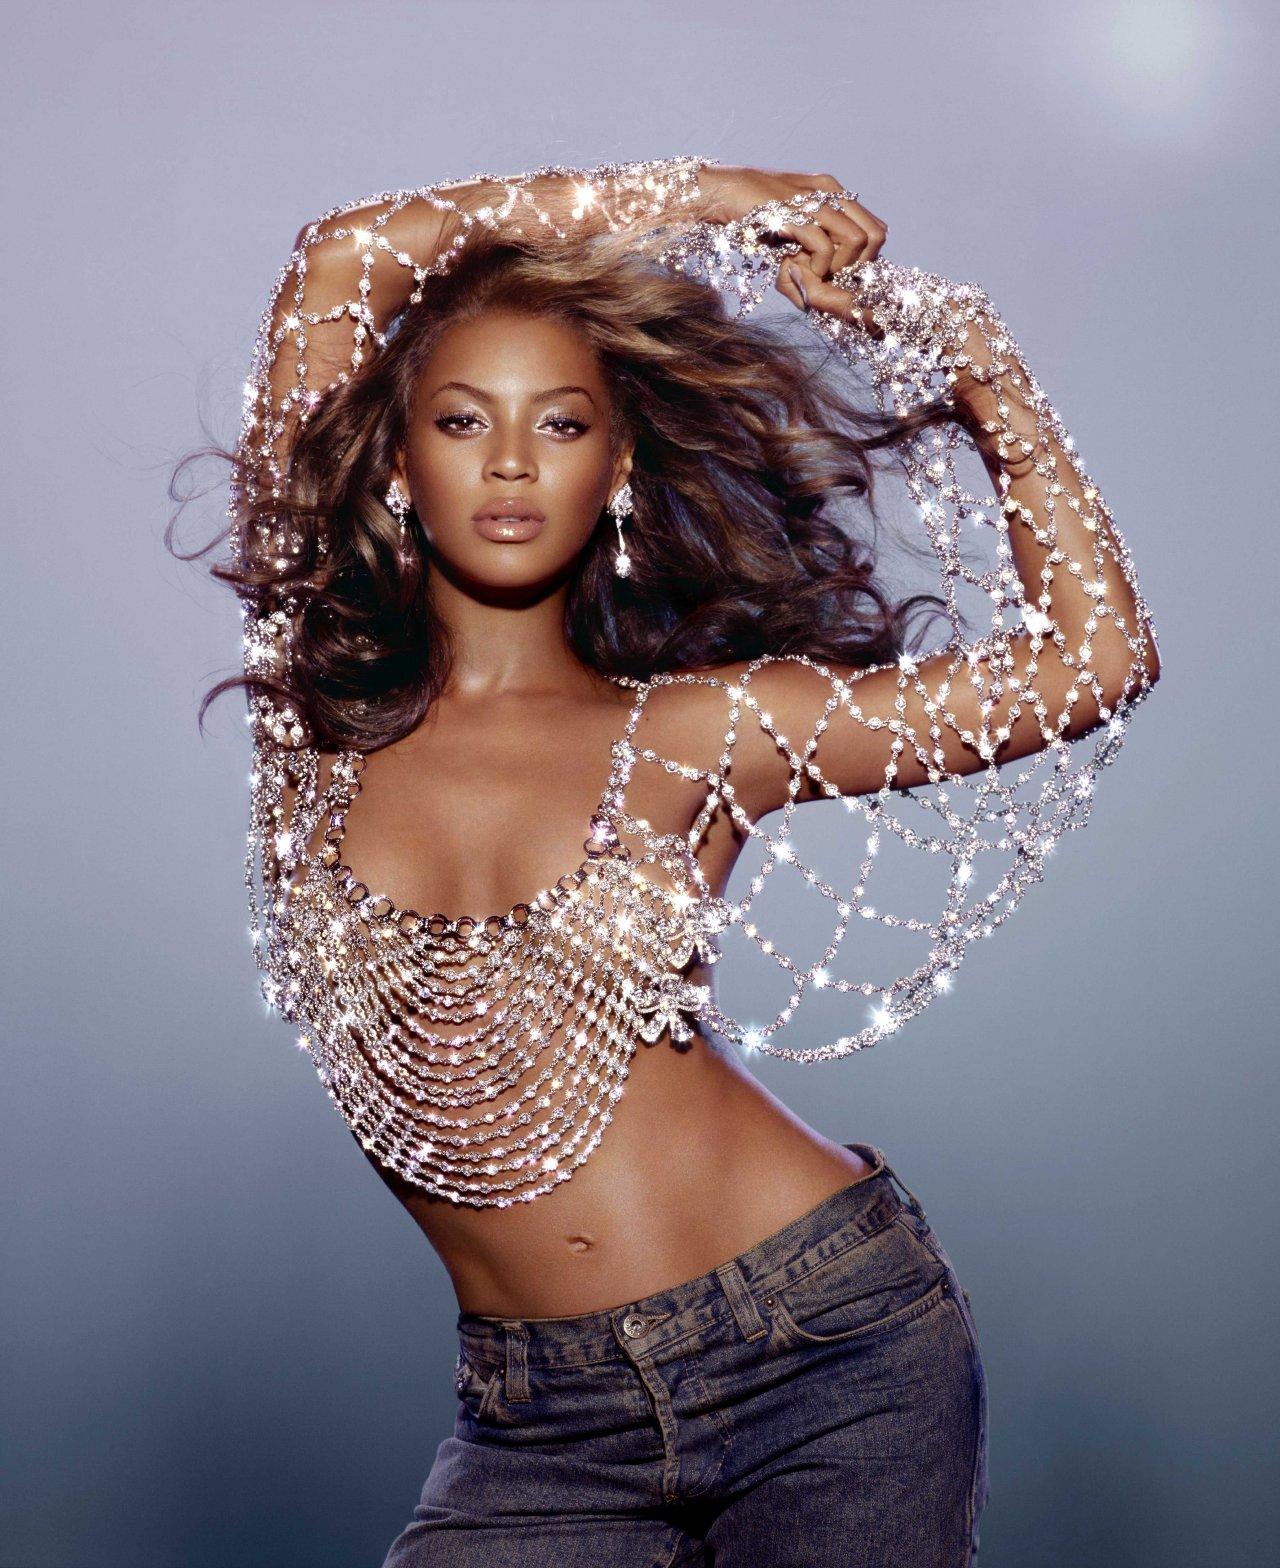 http://4.bp.blogspot.com/-SMmLE02zbZk/Tdq8Y_cmteI/AAAAAAAAIxw/UxauZcaJhXk/s1600/41379_actress-singer-beyonce-knowles-671255_122_826lo.jpg